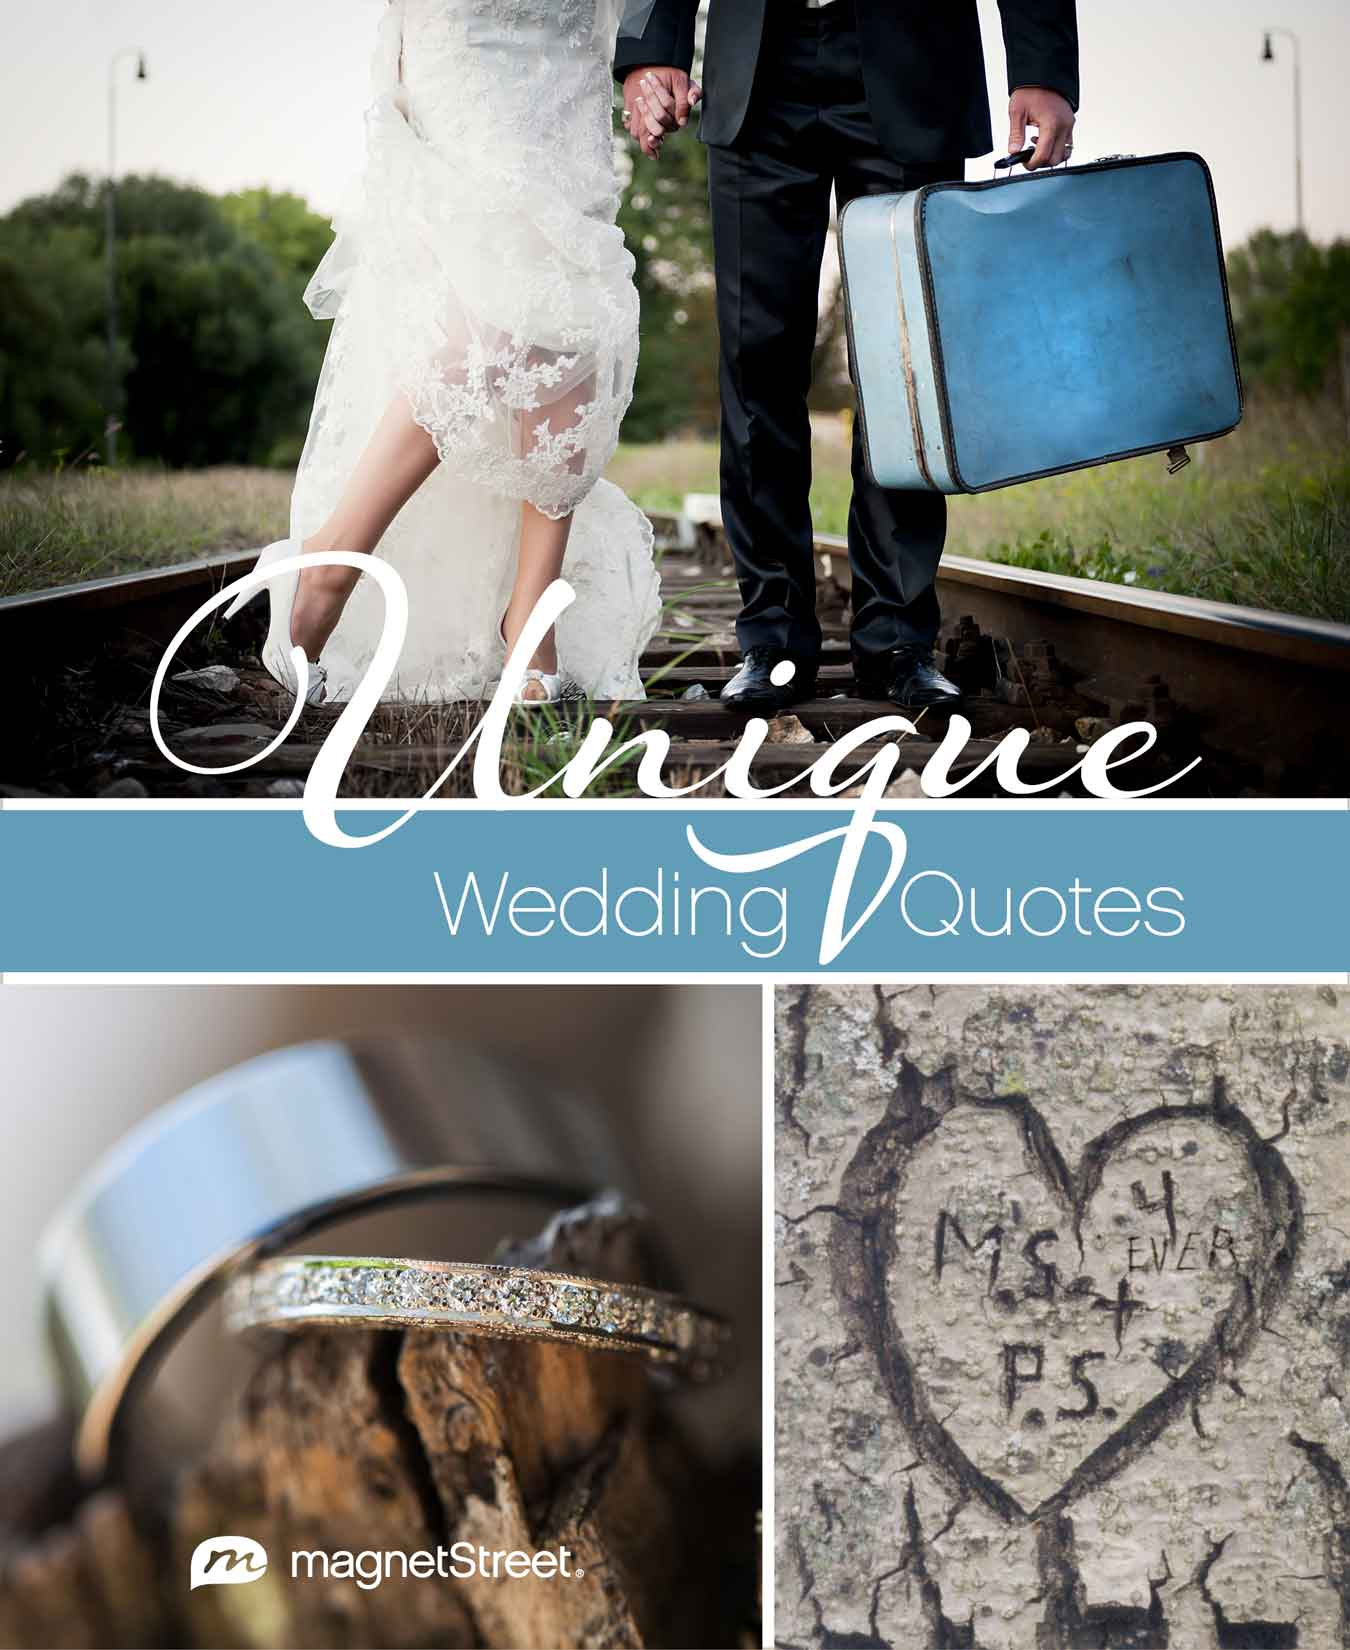 Unique Wedding Quotes for your Wedding Invitation or Wedding Program  MagnetStreet Wedding